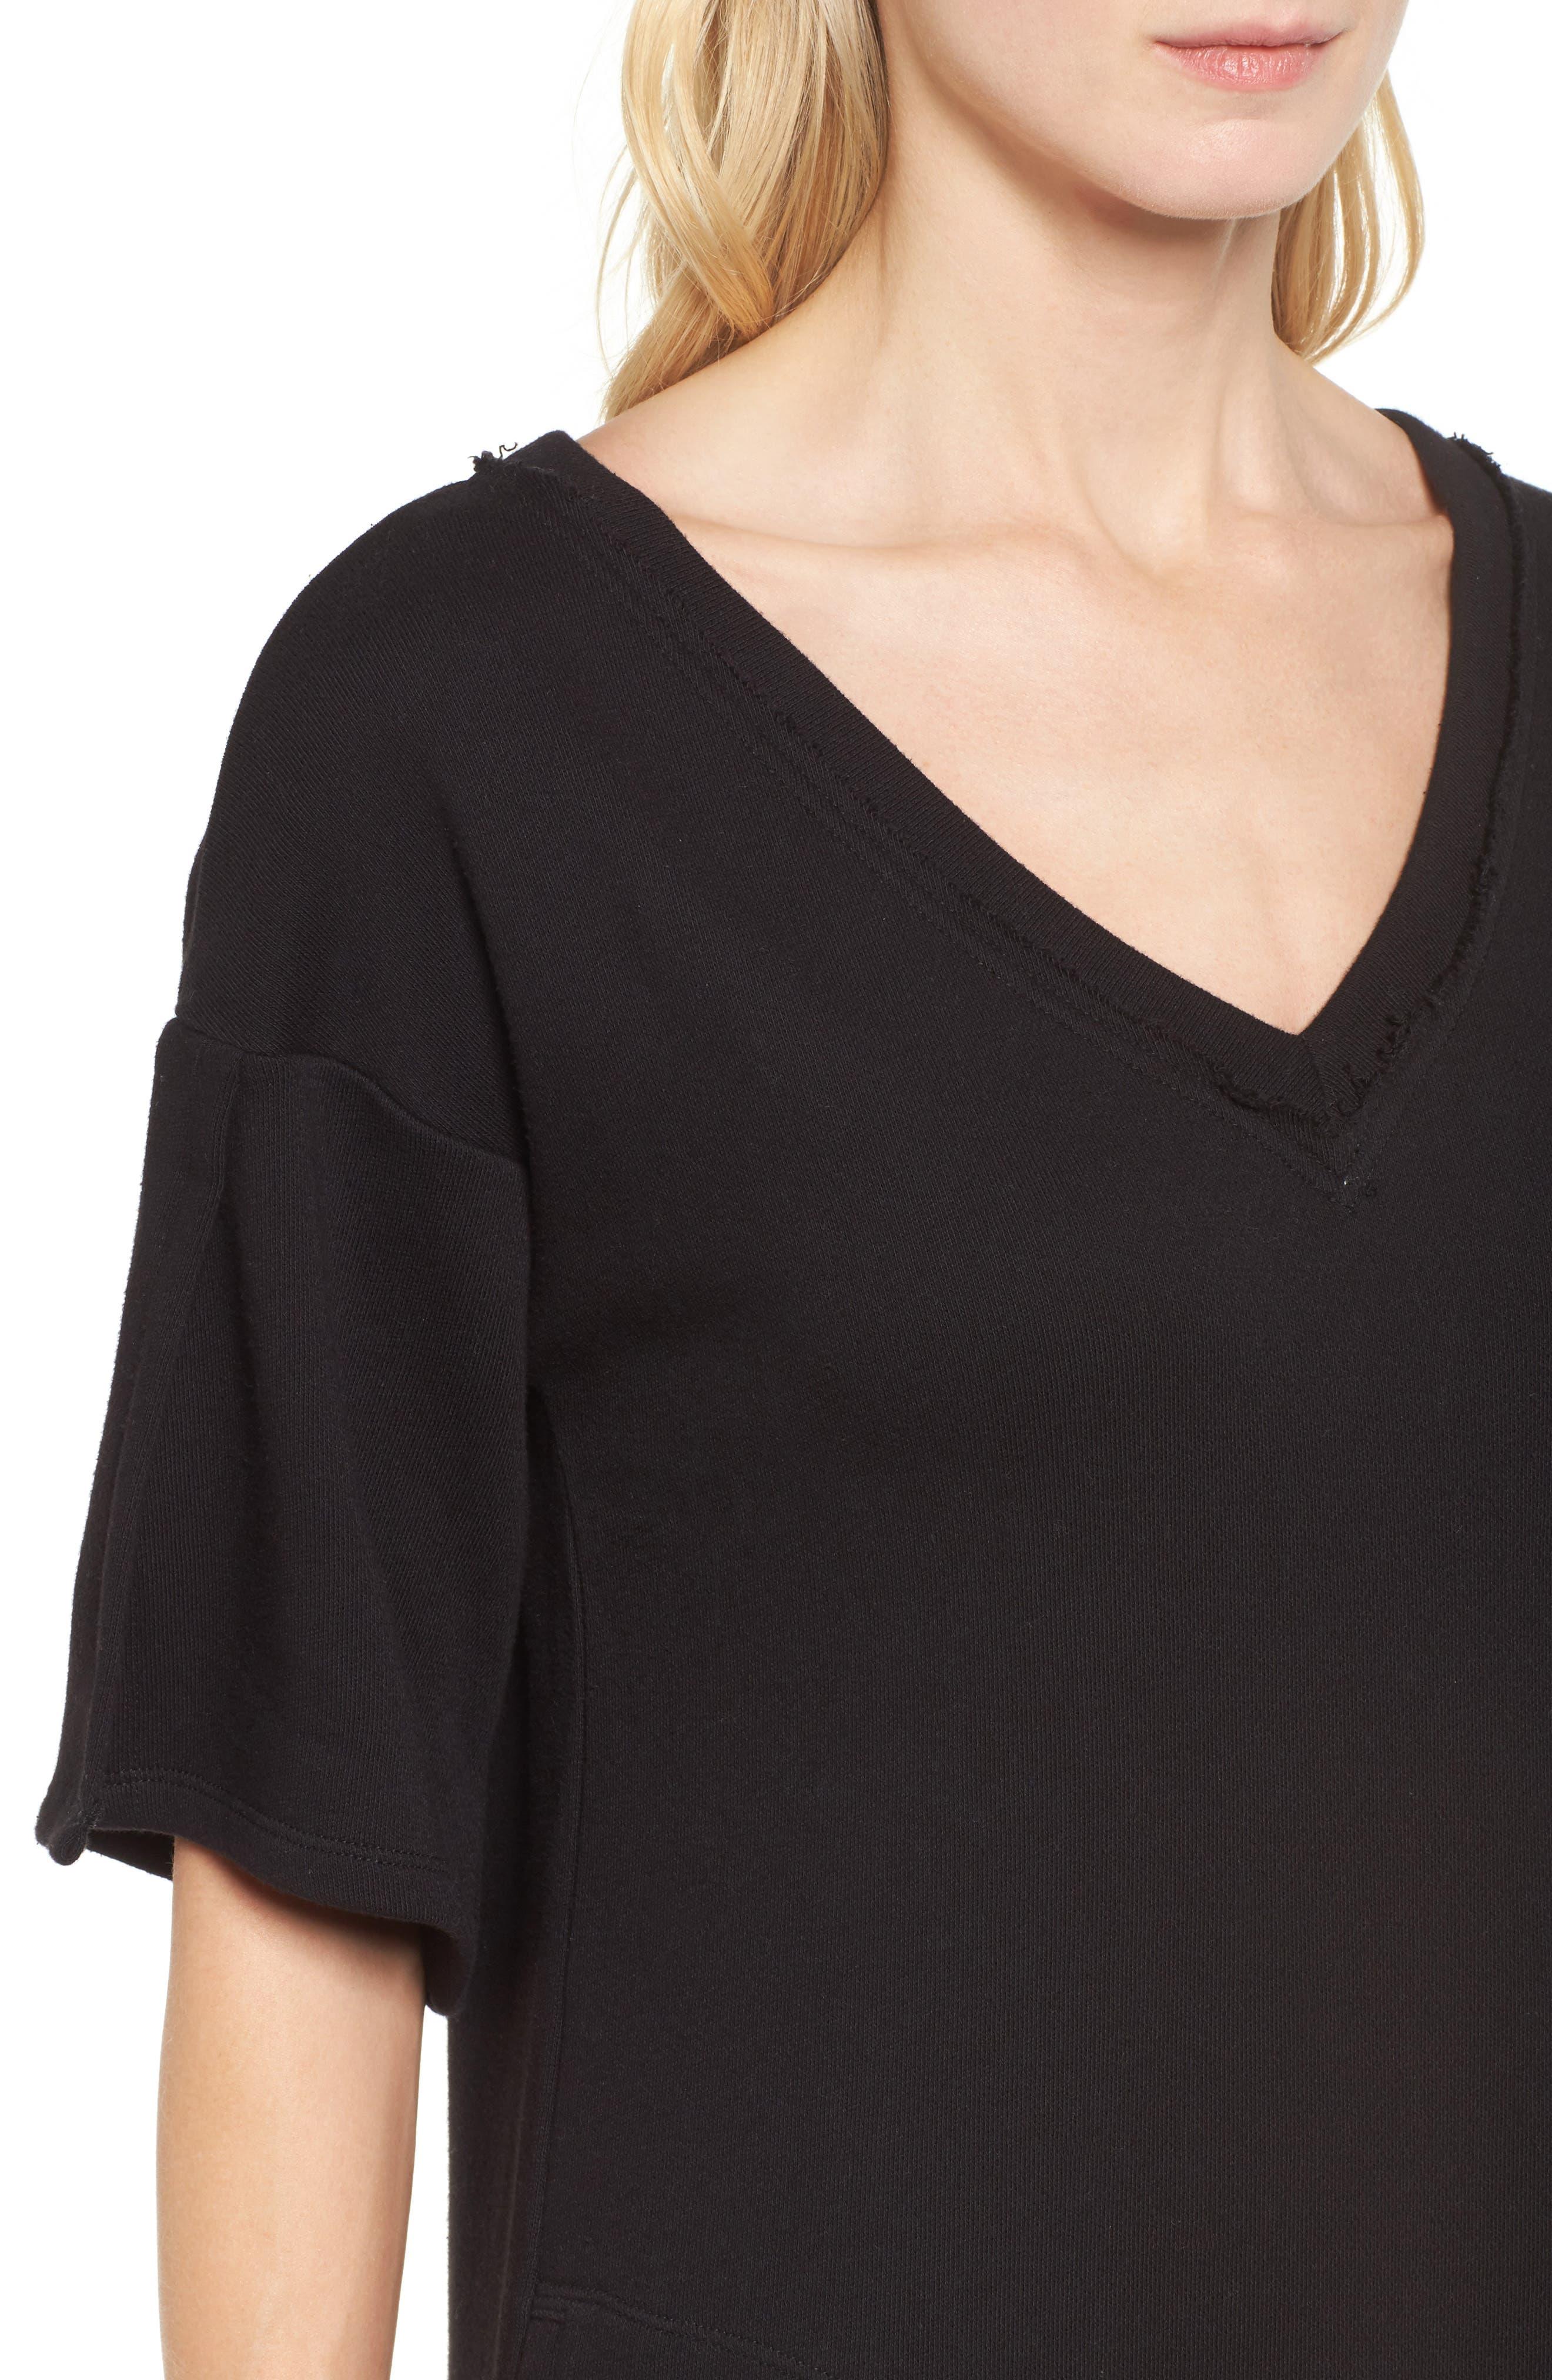 Lace-Up T-Shirt Dress,                             Alternate thumbnail 4, color,                             Black